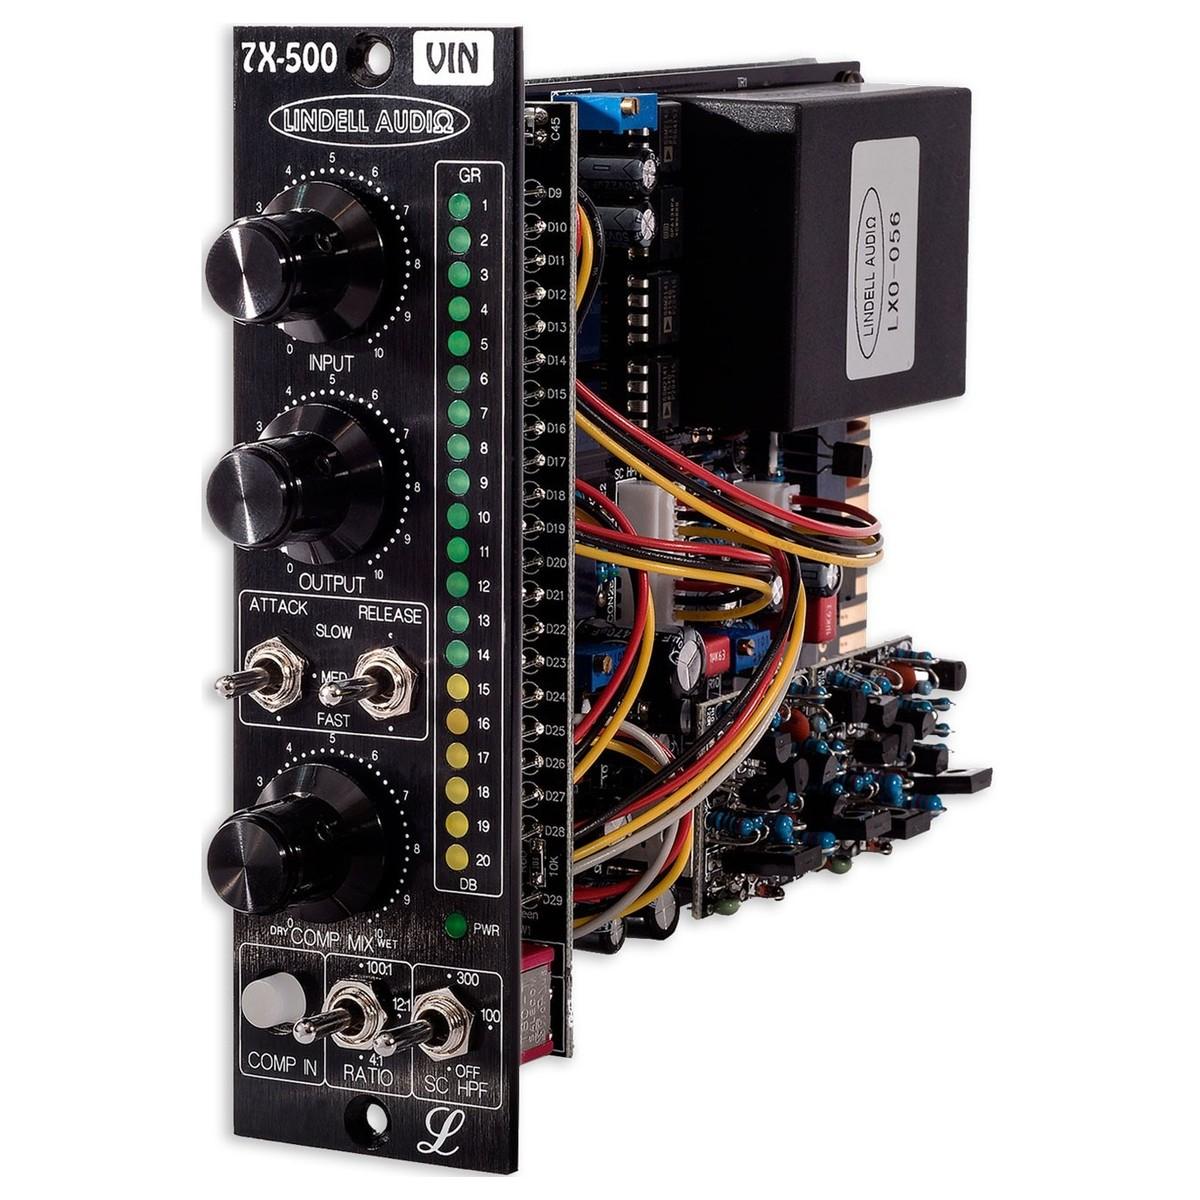 lindell audio 7x500vin 500 series compressor at gear4music. Black Bedroom Furniture Sets. Home Design Ideas